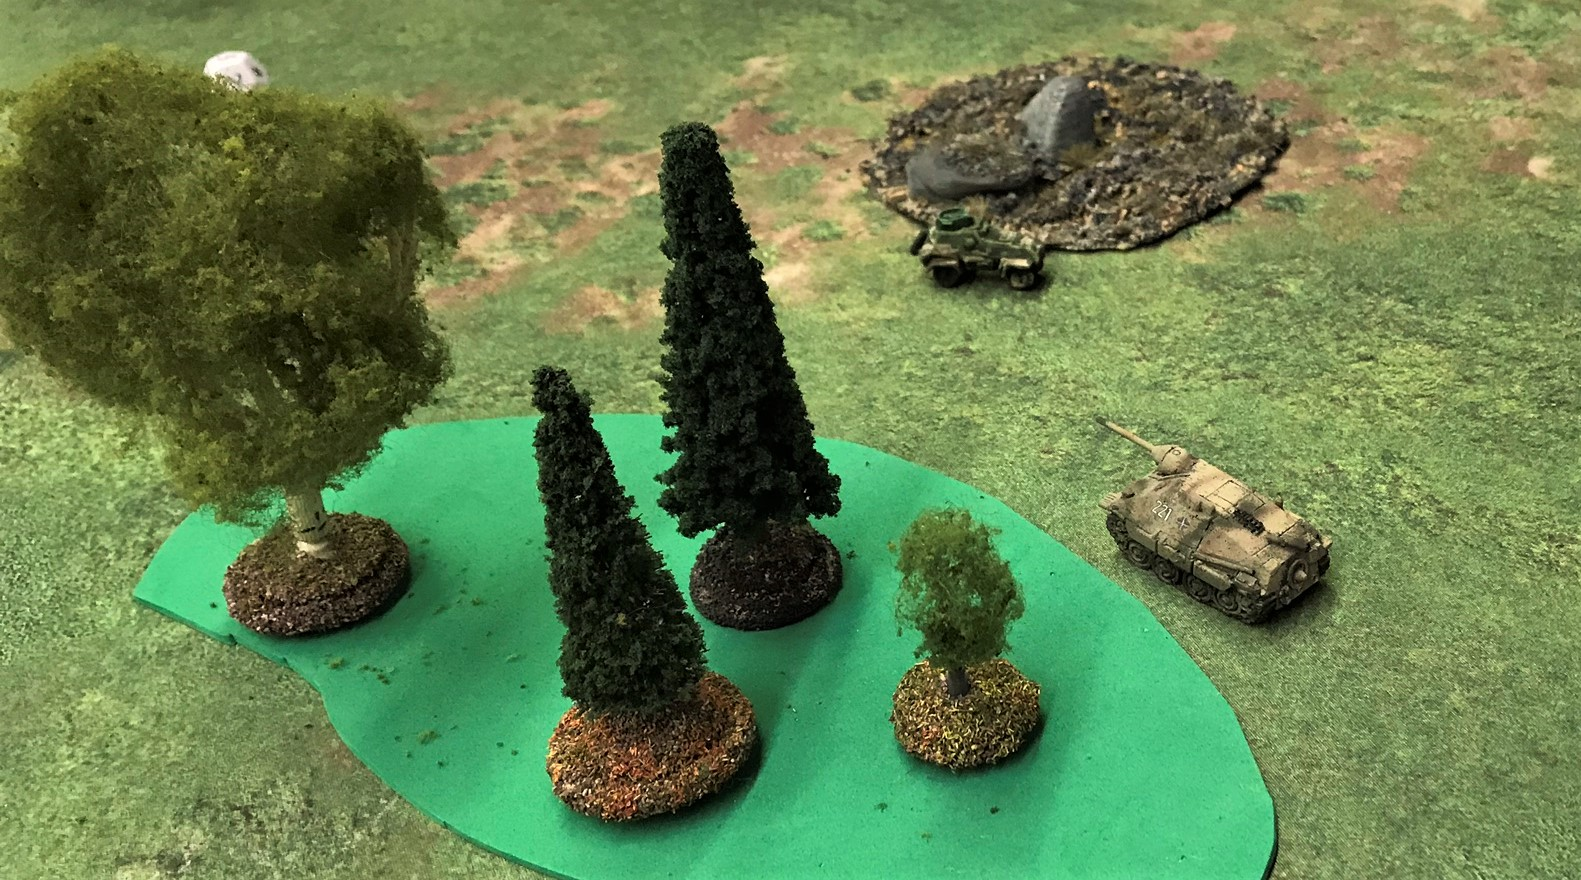 5 Hetzer chases KV-1a